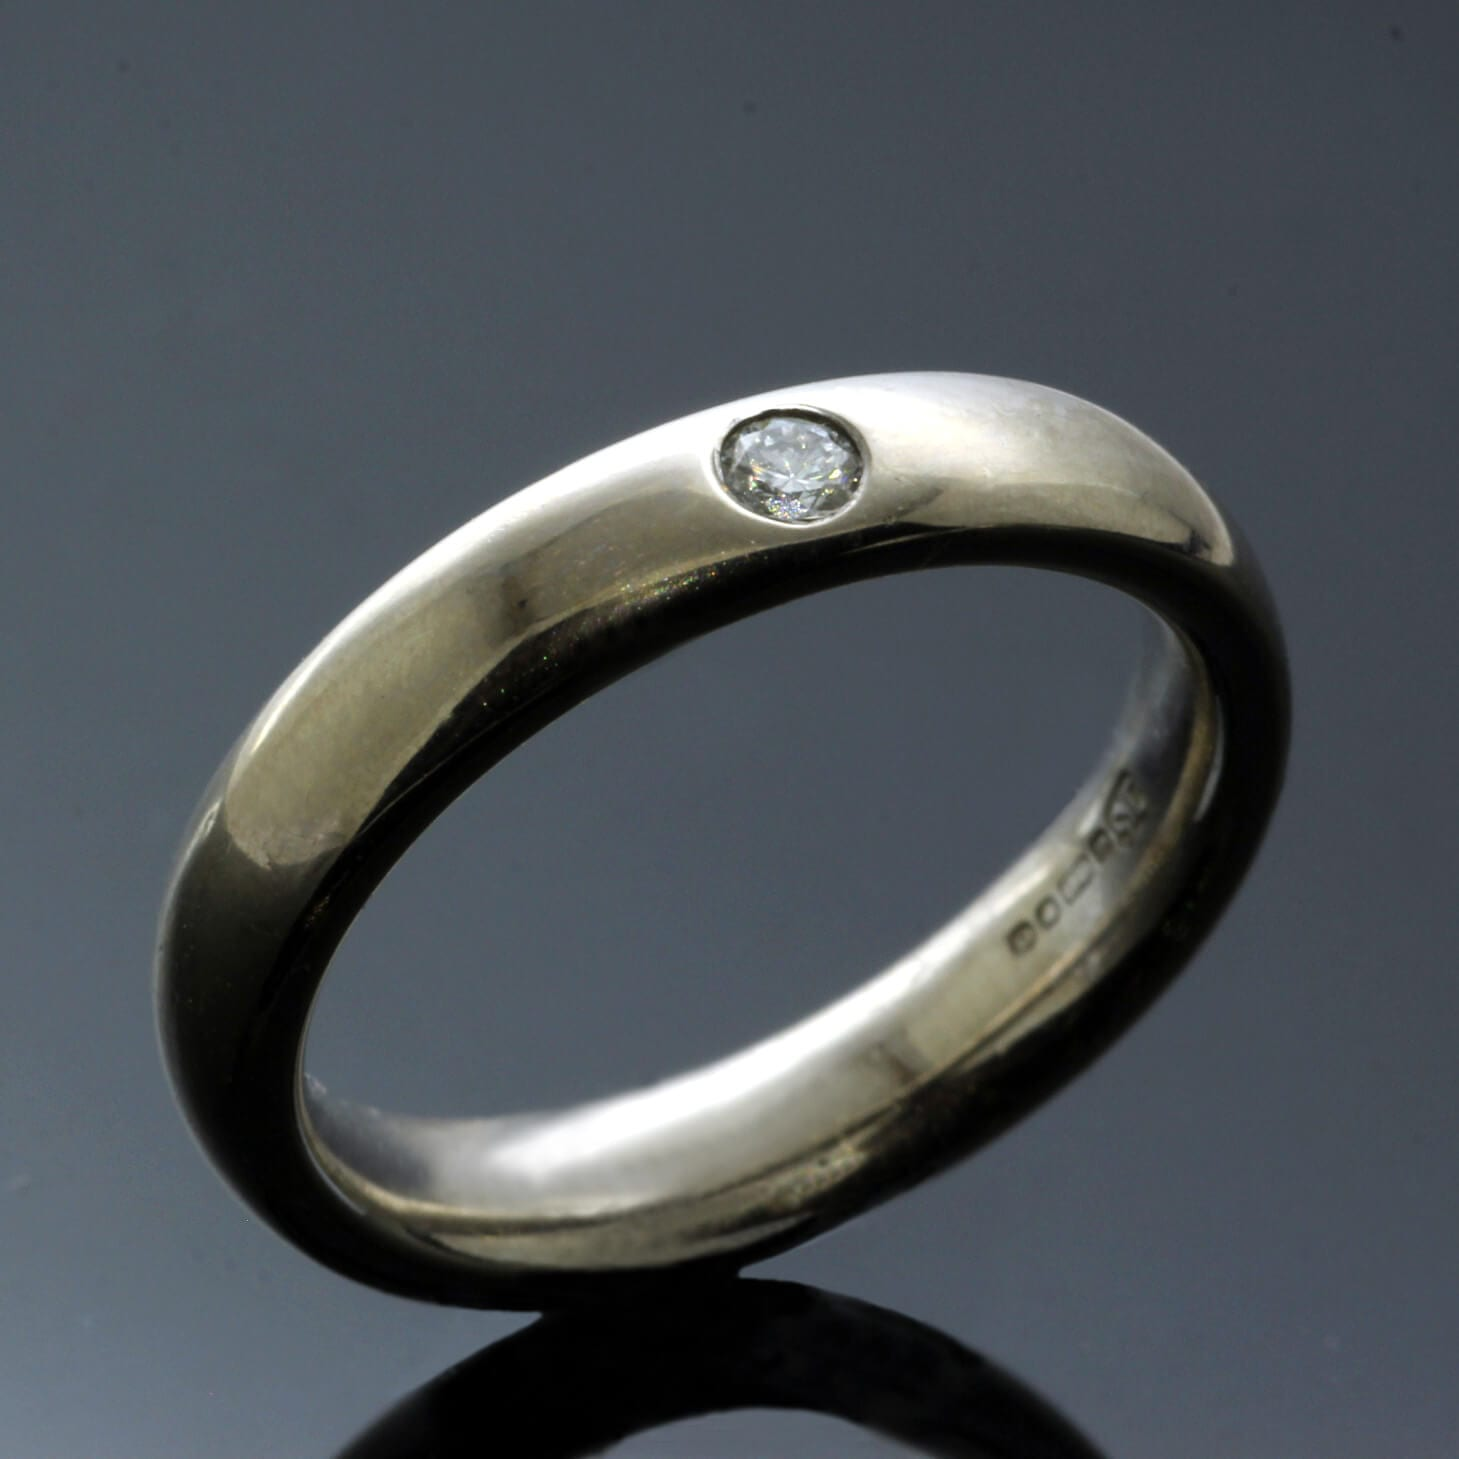 Unique personal handmade wedding bands Diamond flush set 18ct White Gold Court ring